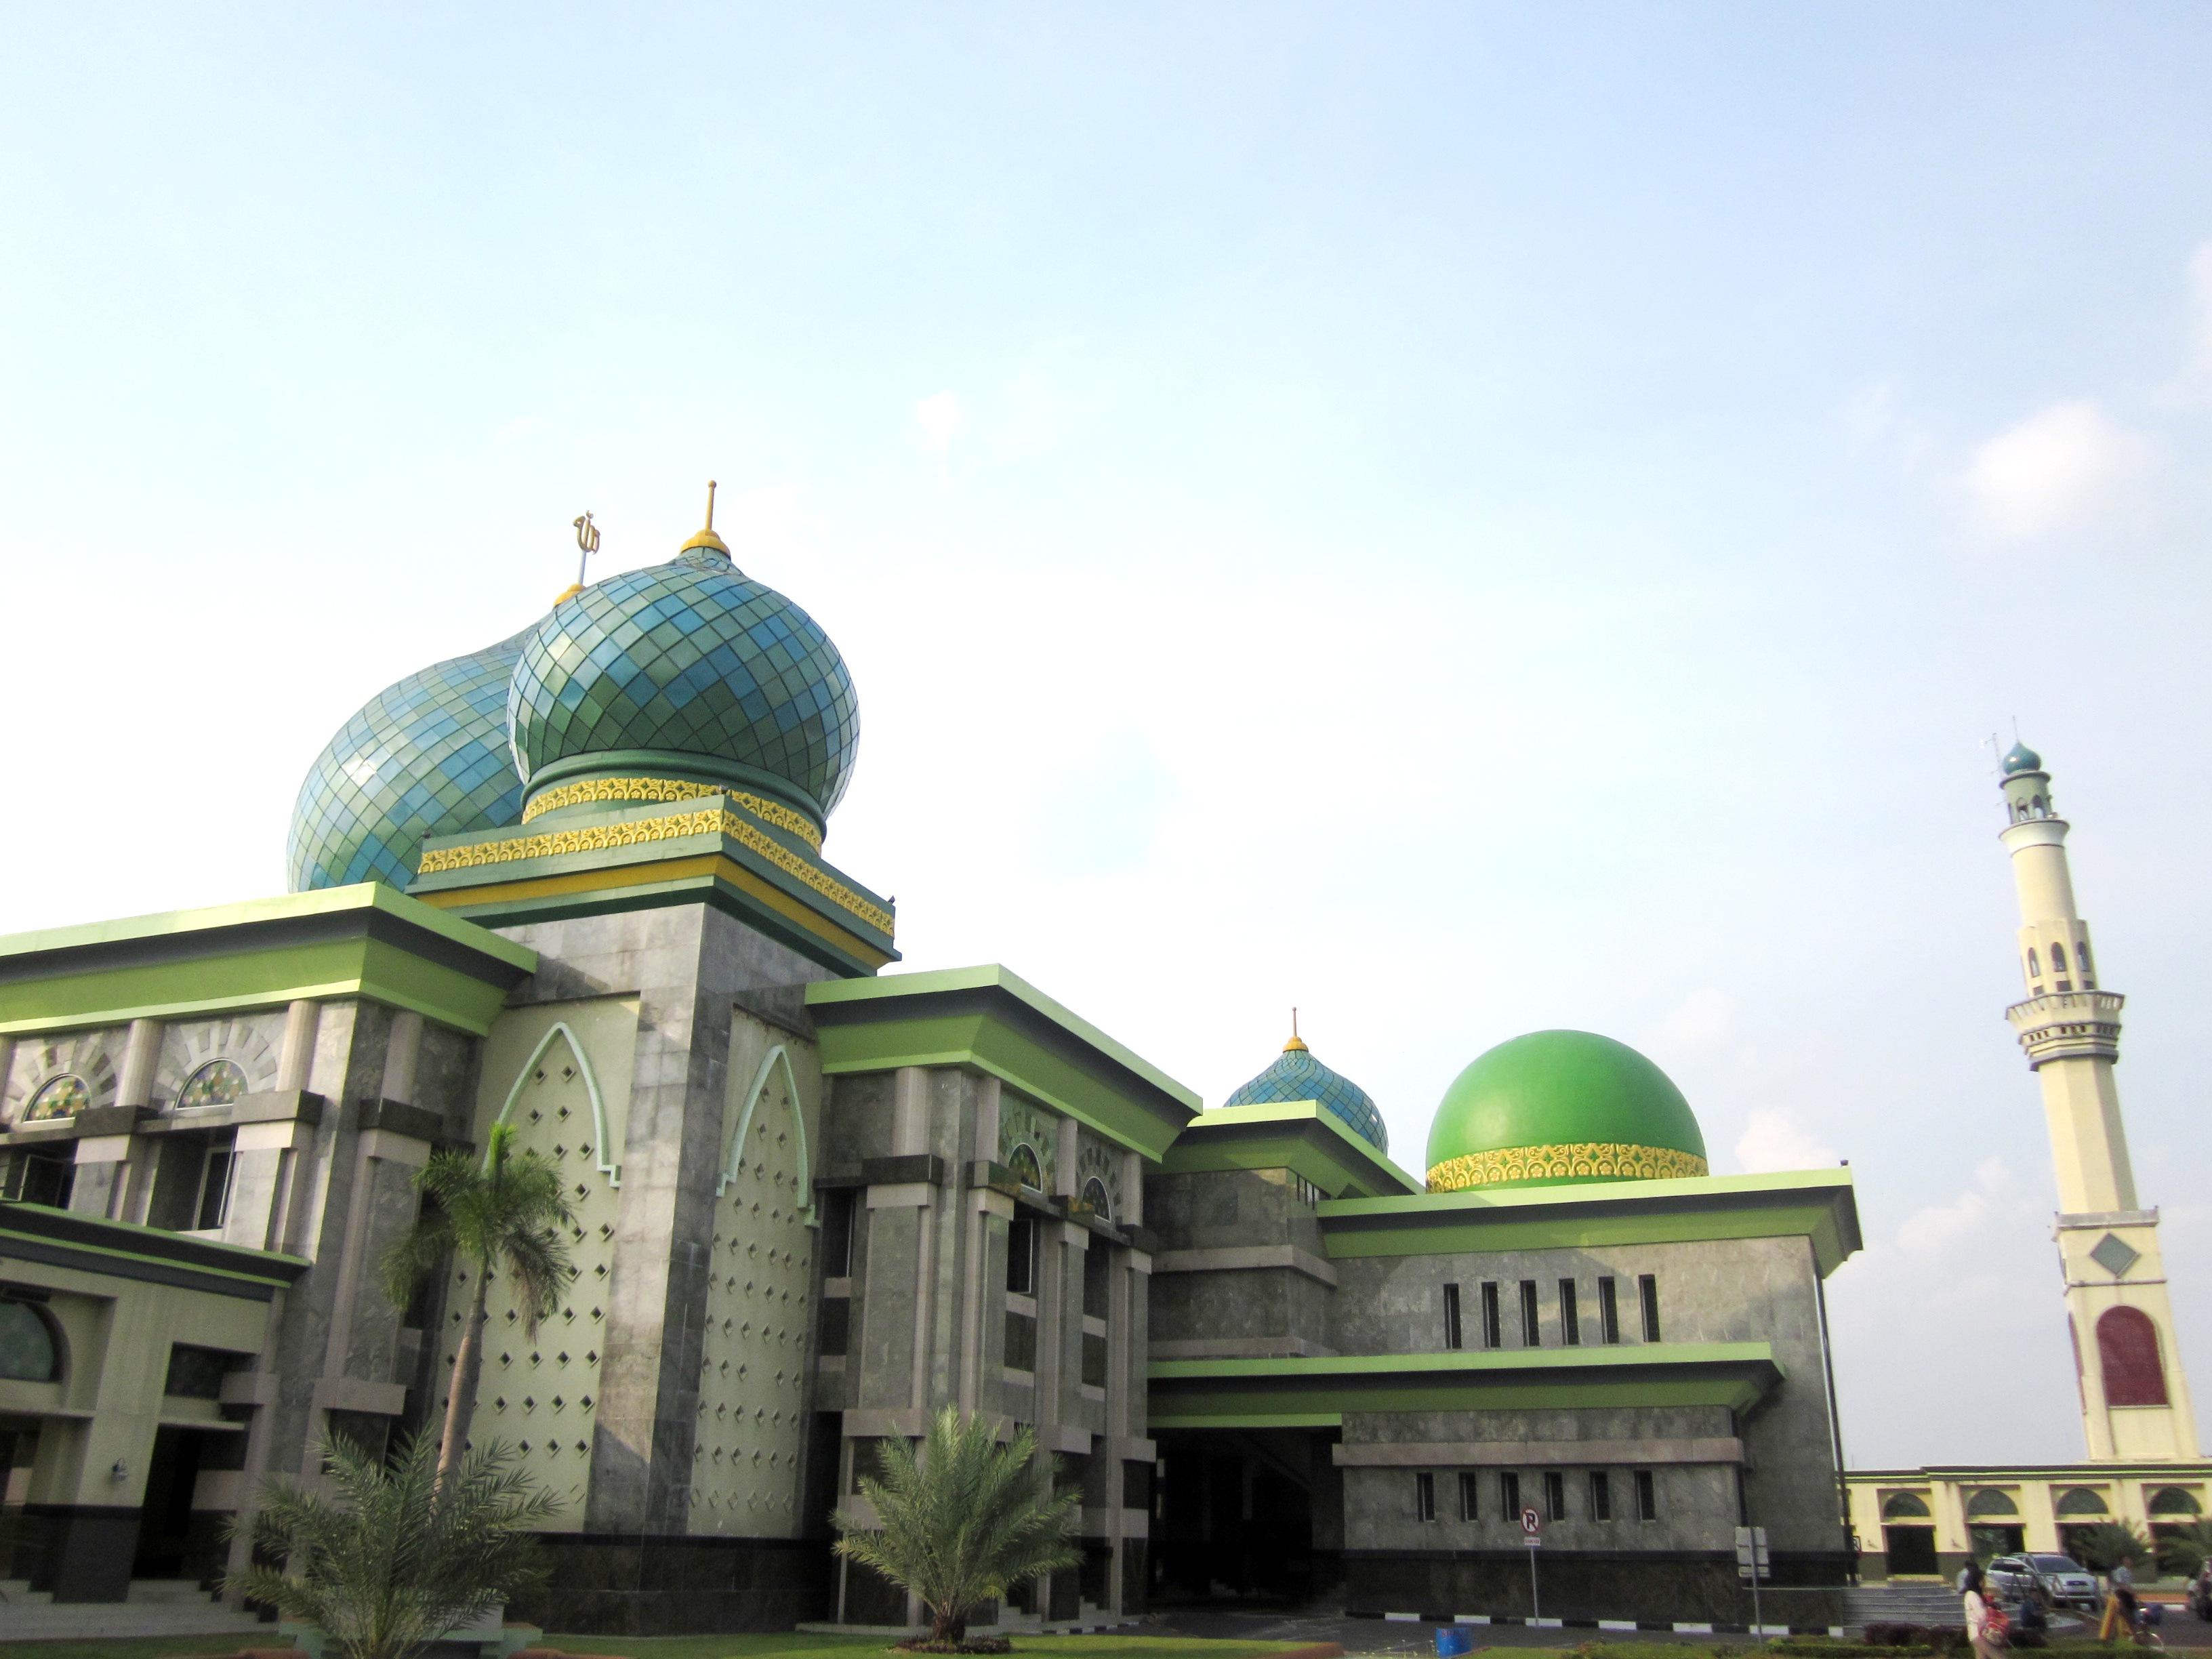 Masjid Agung Nur Dunia Jakarta Islamic Centre Pekanbaru Riau Kota